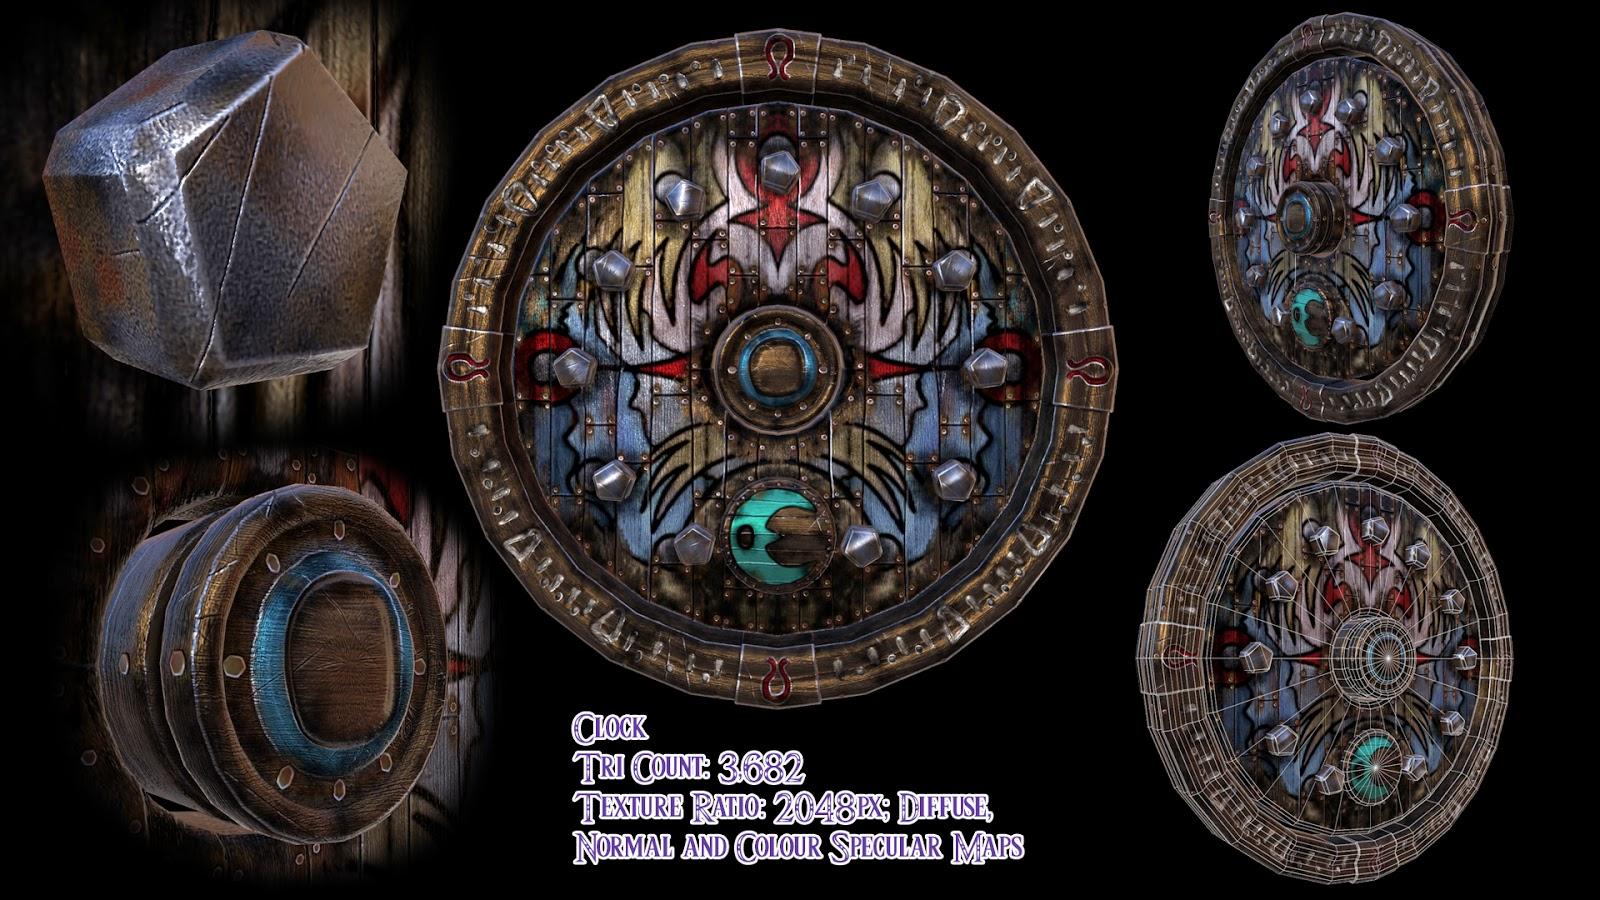 Kevin Adanan U0026 39 S Portfolio   U0026quot The Legend Of Zelda  Majora U0026 39 S